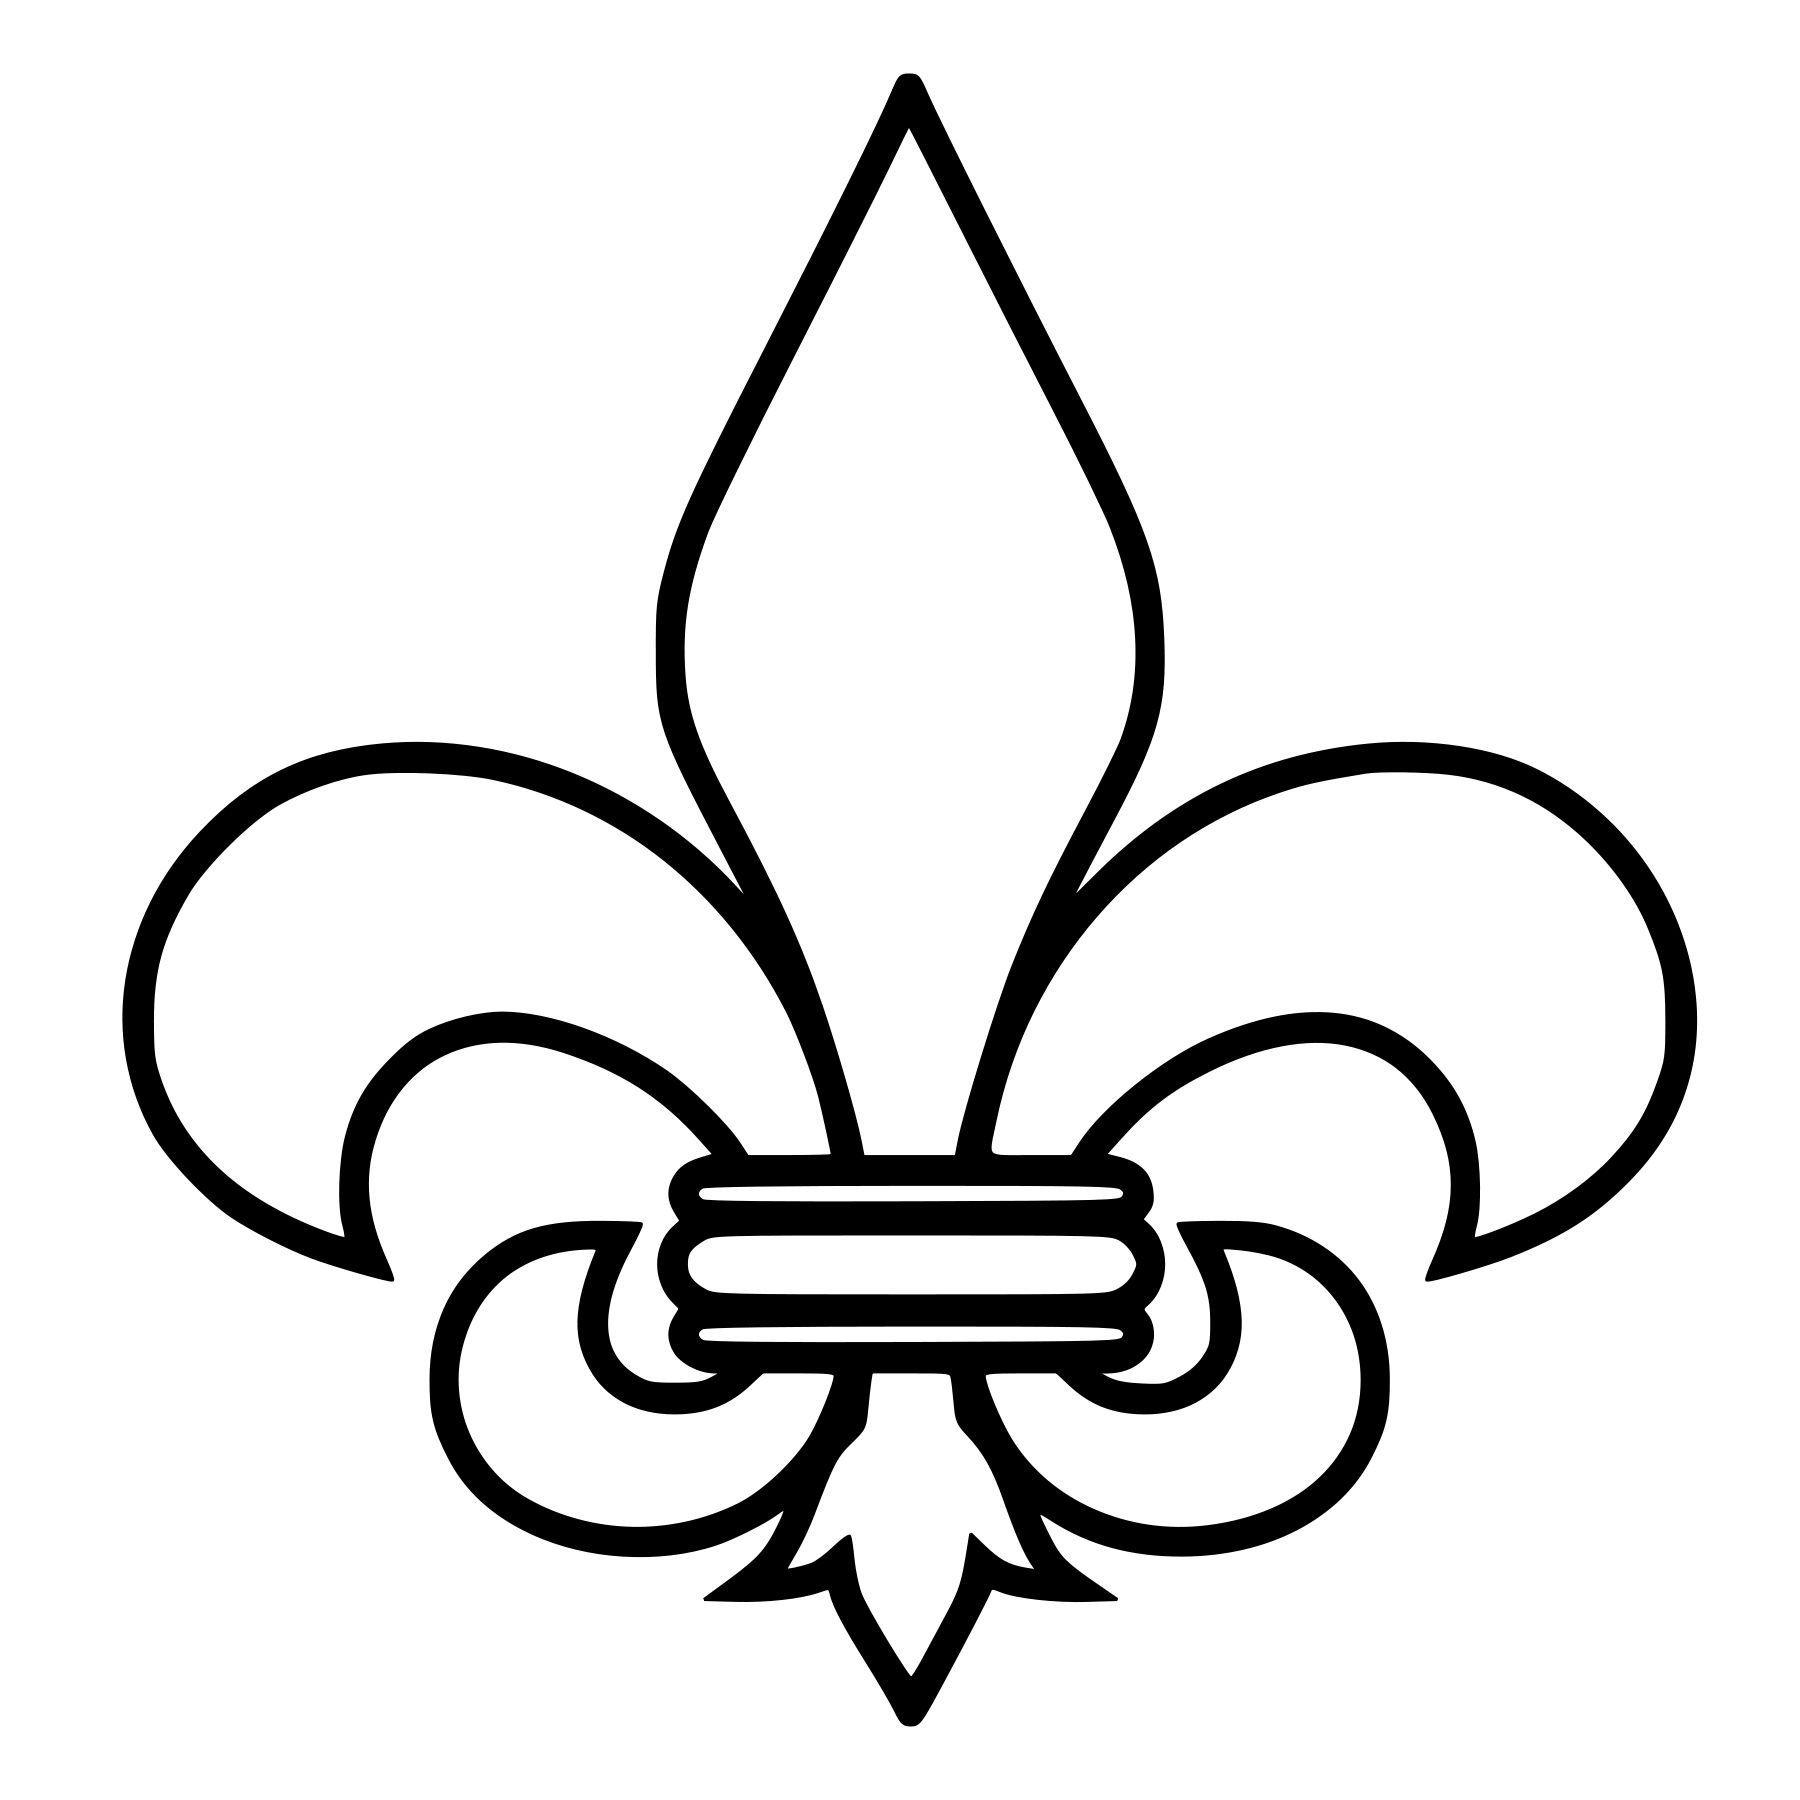 Fleur De Lis Rubber Stamp Mounted Wood Block Art Stamp Etsy In 2021 Art Art Block Fleur De Lis